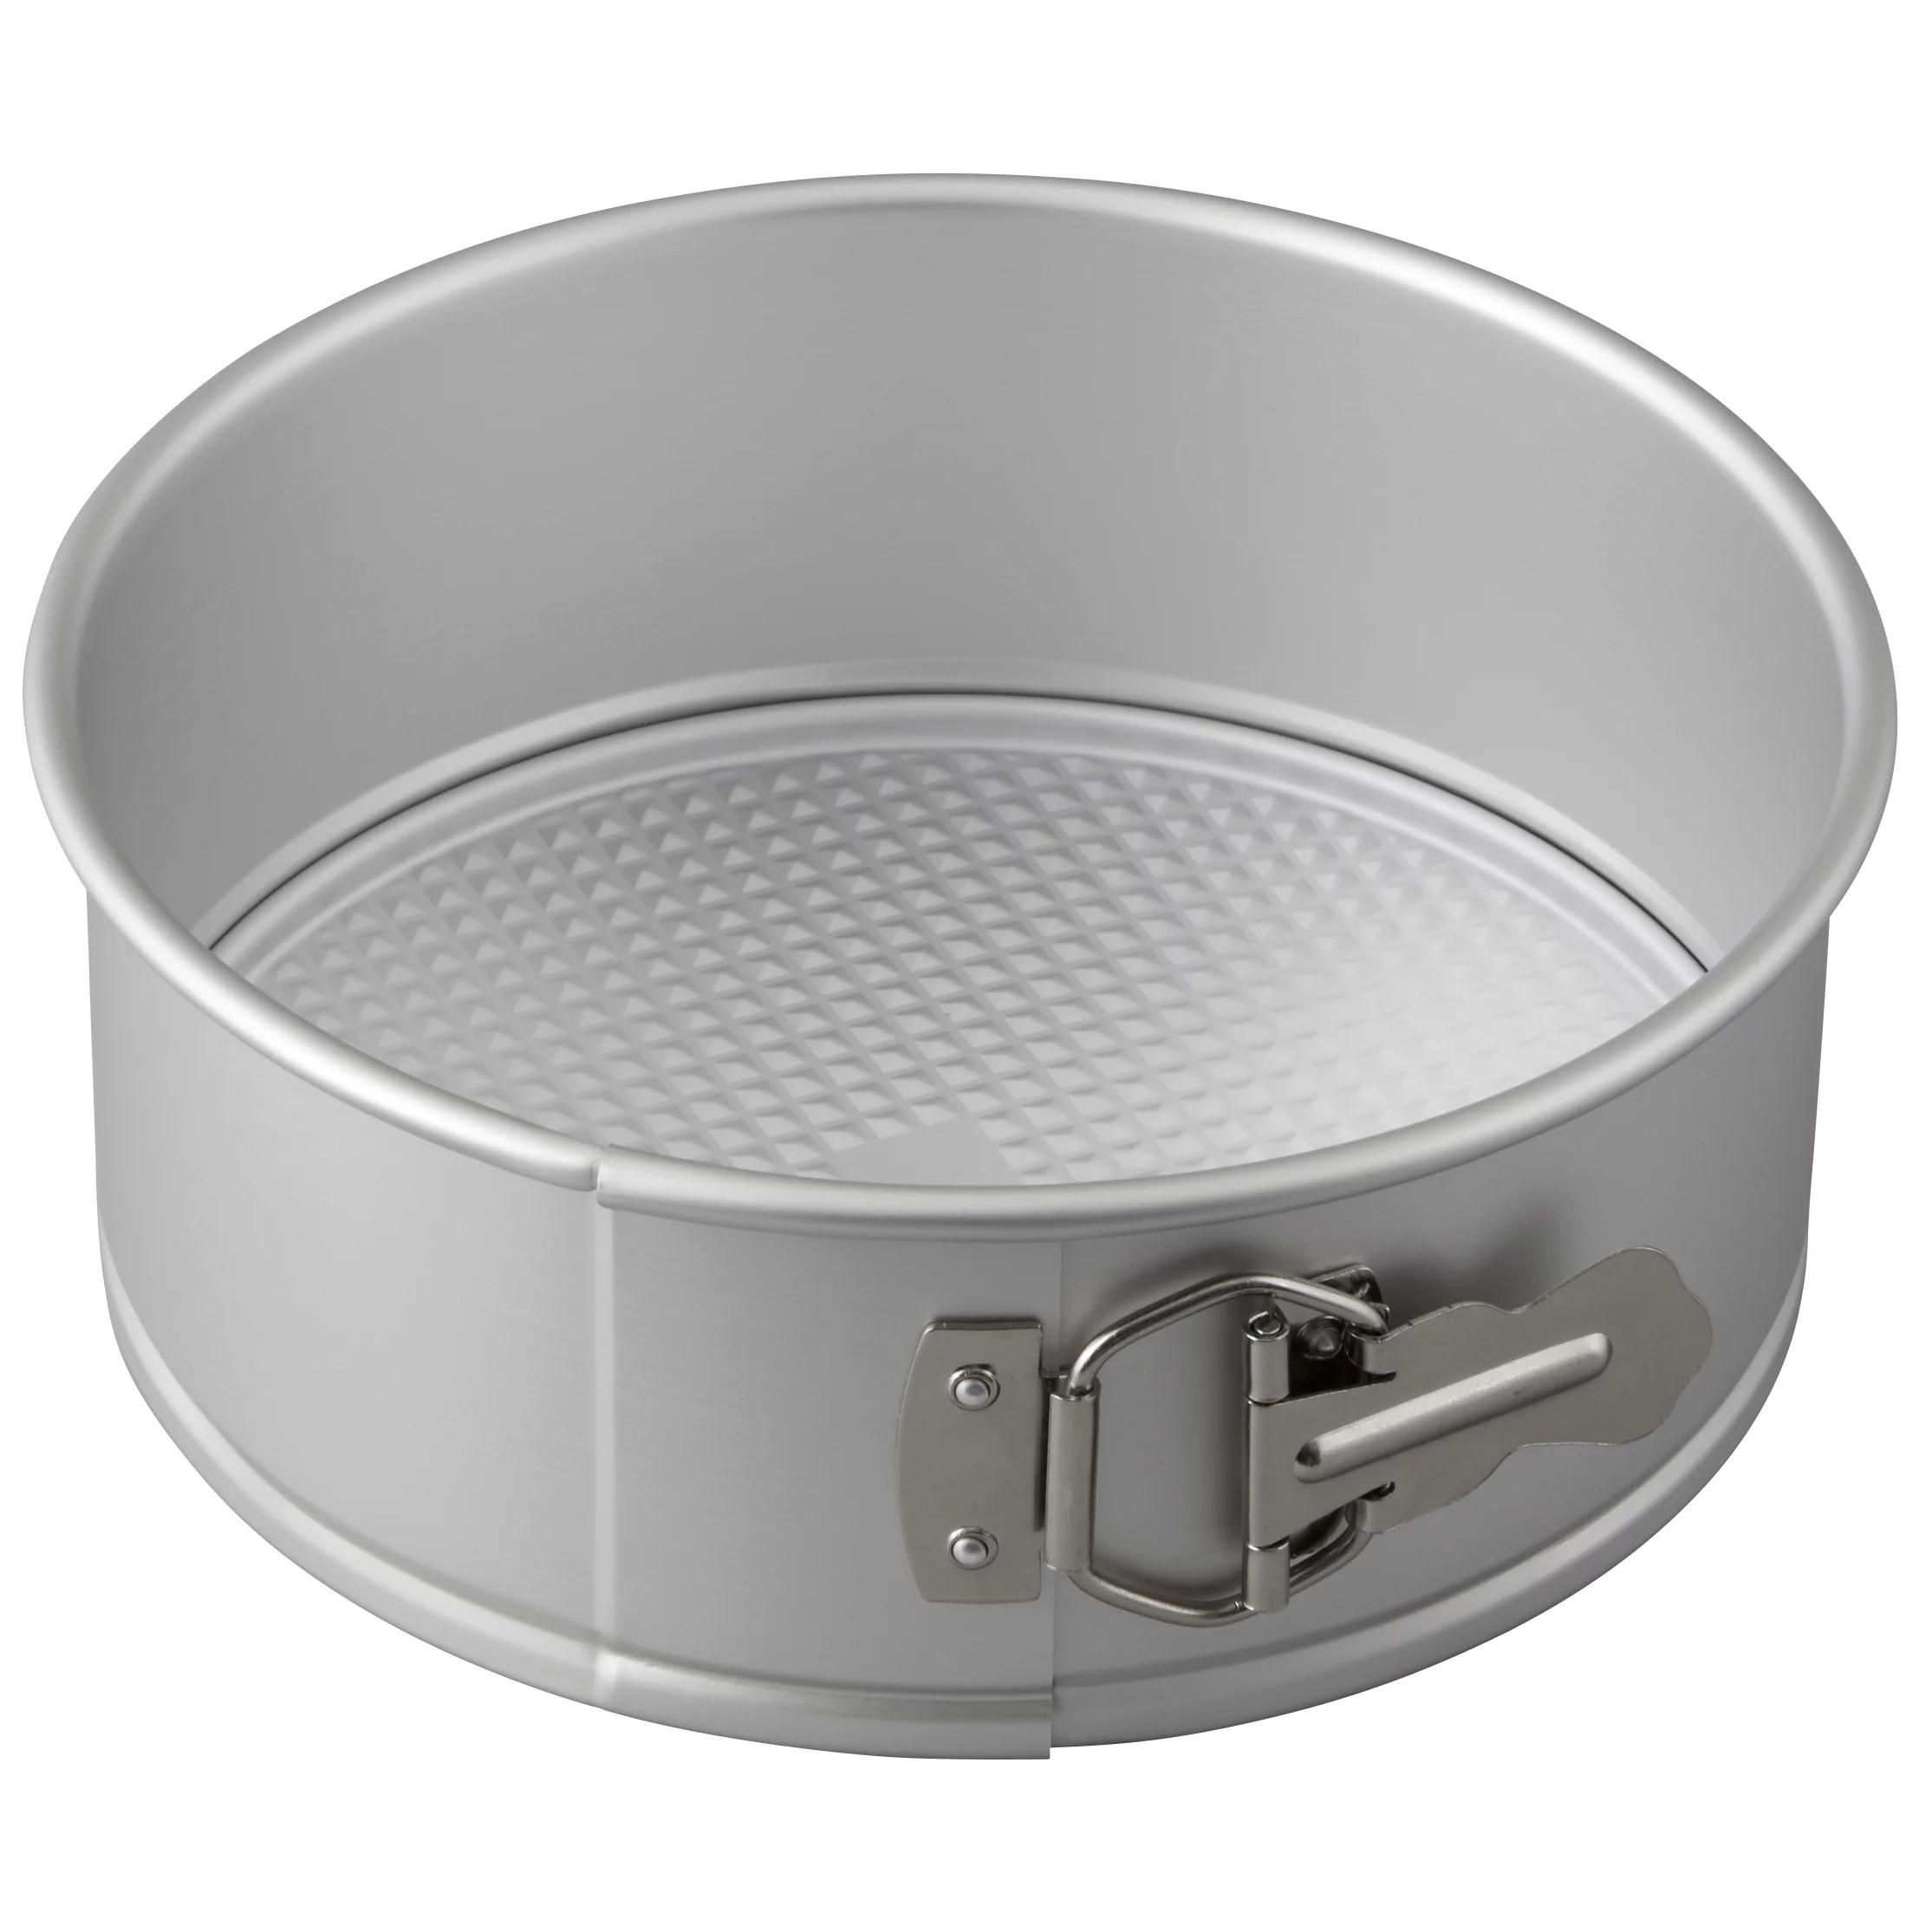 wilton performance pans aluminum springform pan 8 inch cheesecake pan walmart com